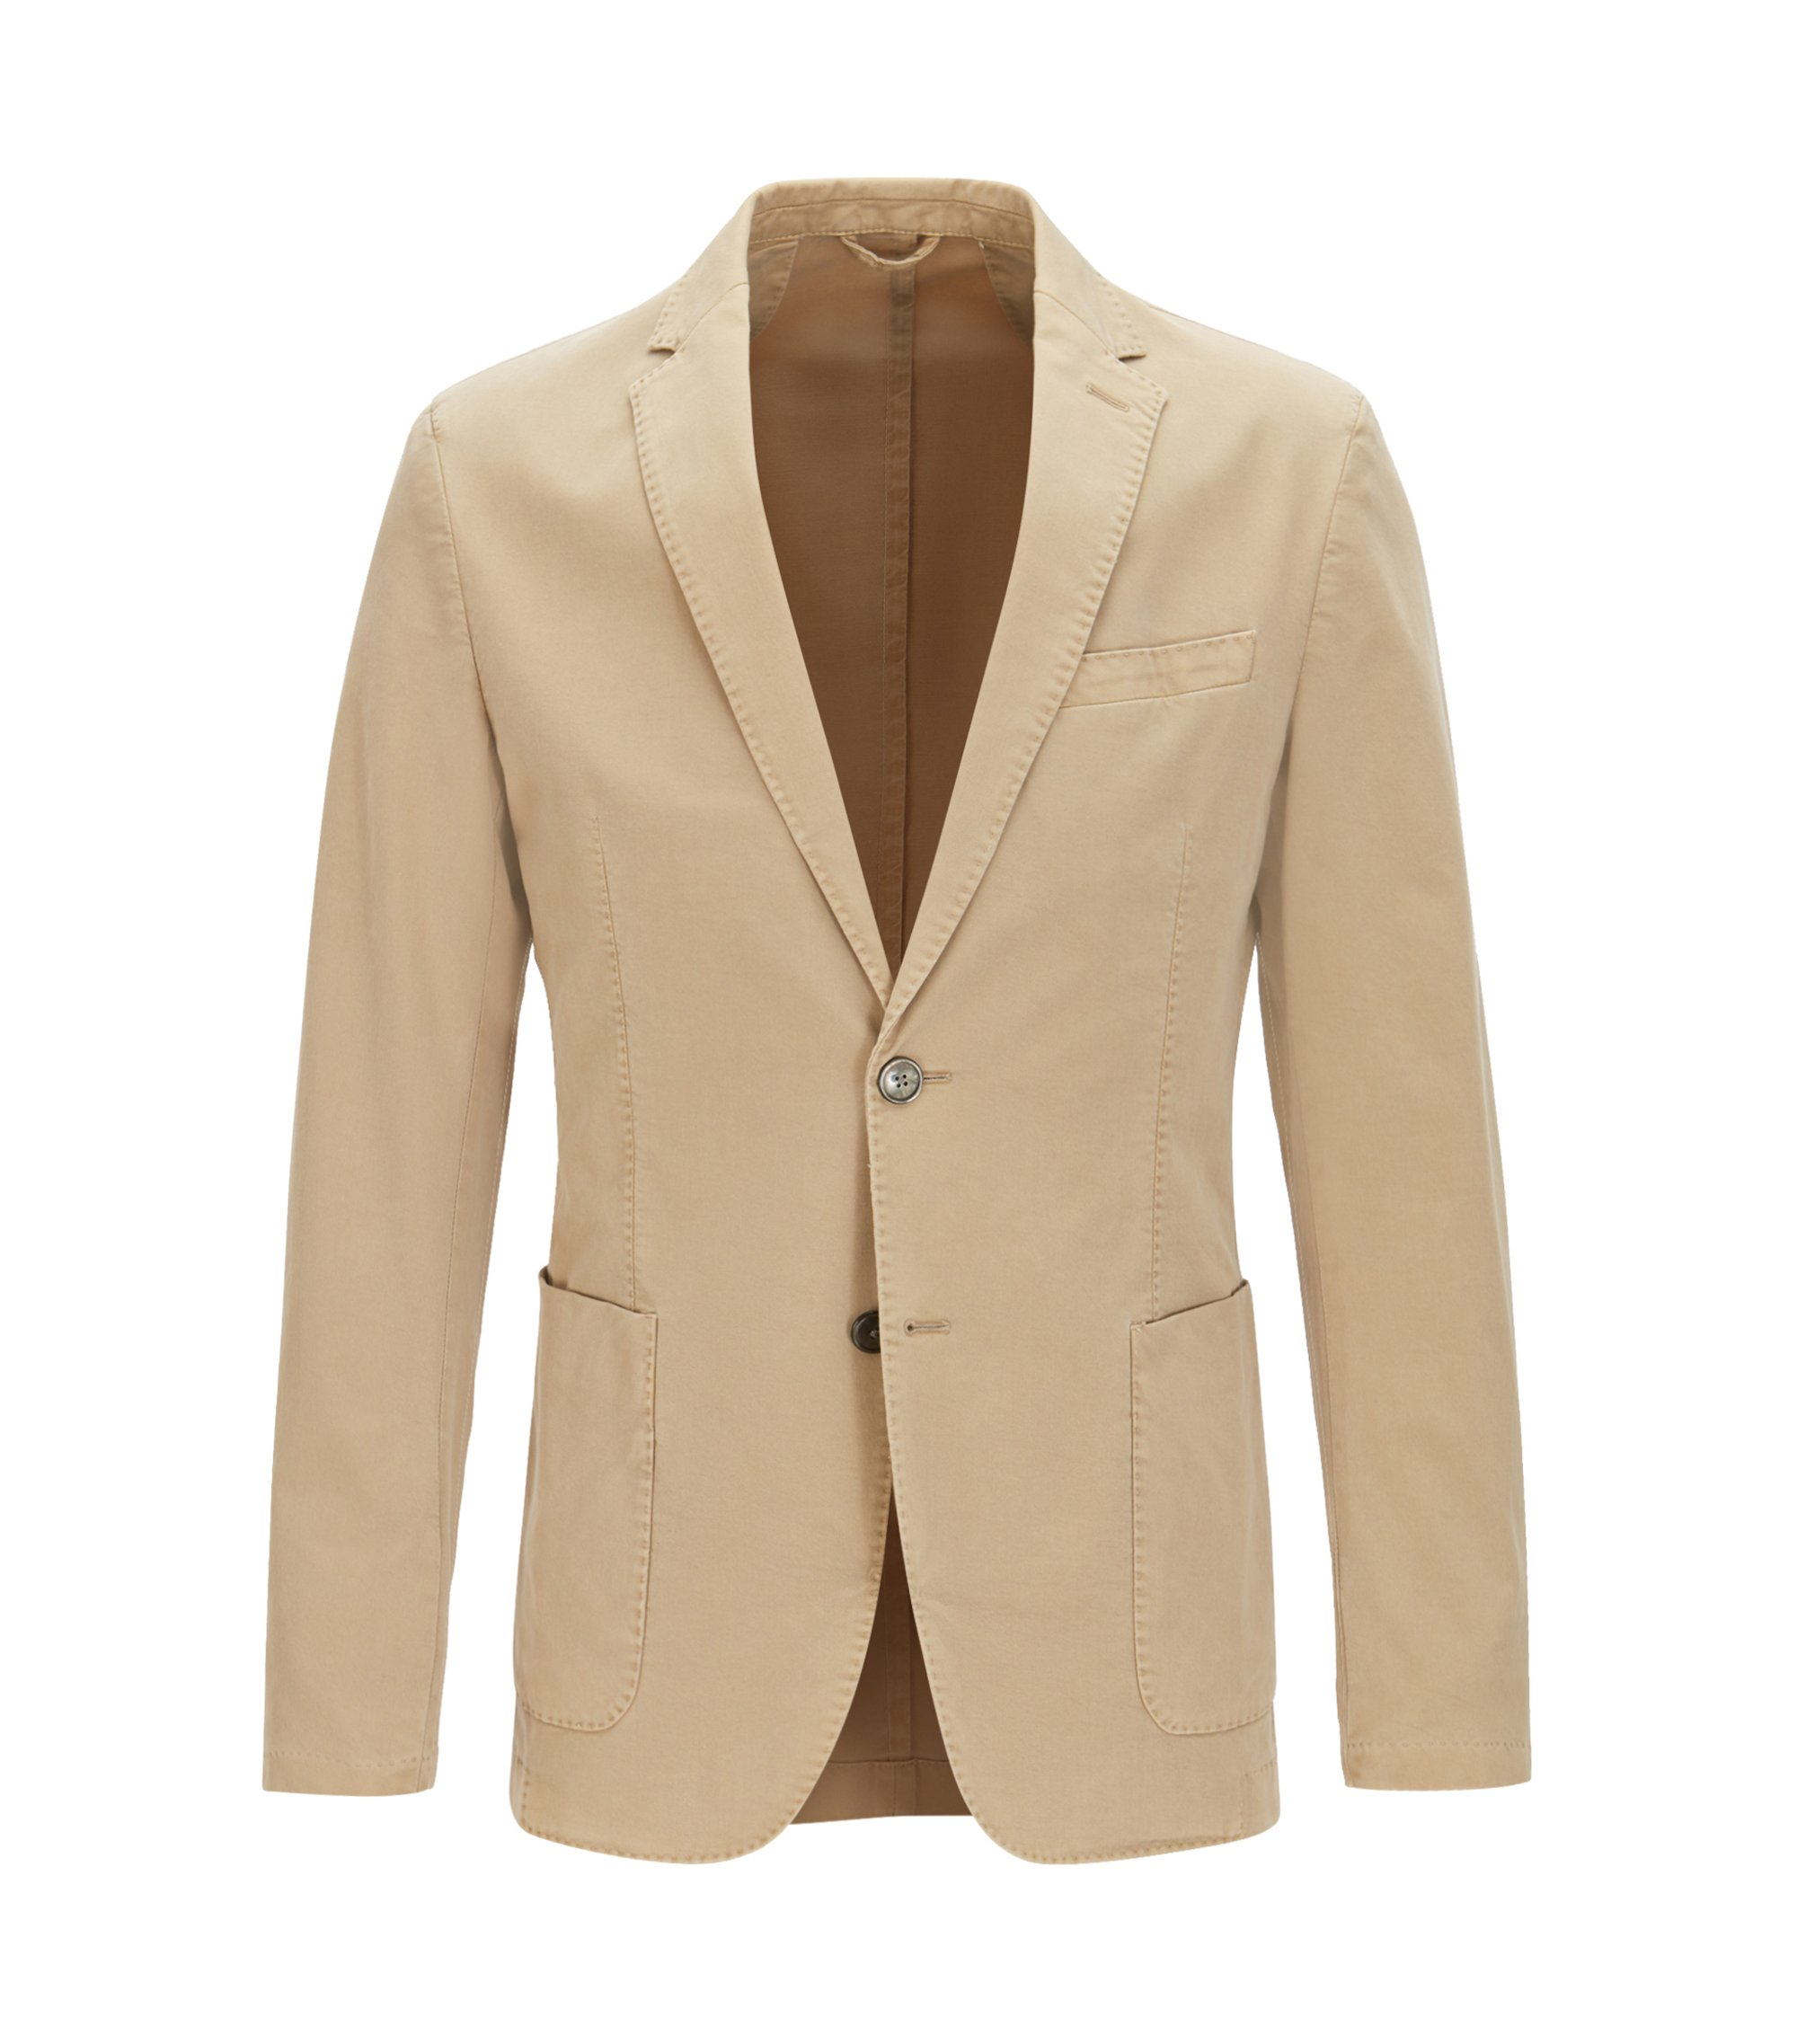 Garment-Dyed Stretch Cotton Sport Coat, Slim Fit | Hanry D, Beige